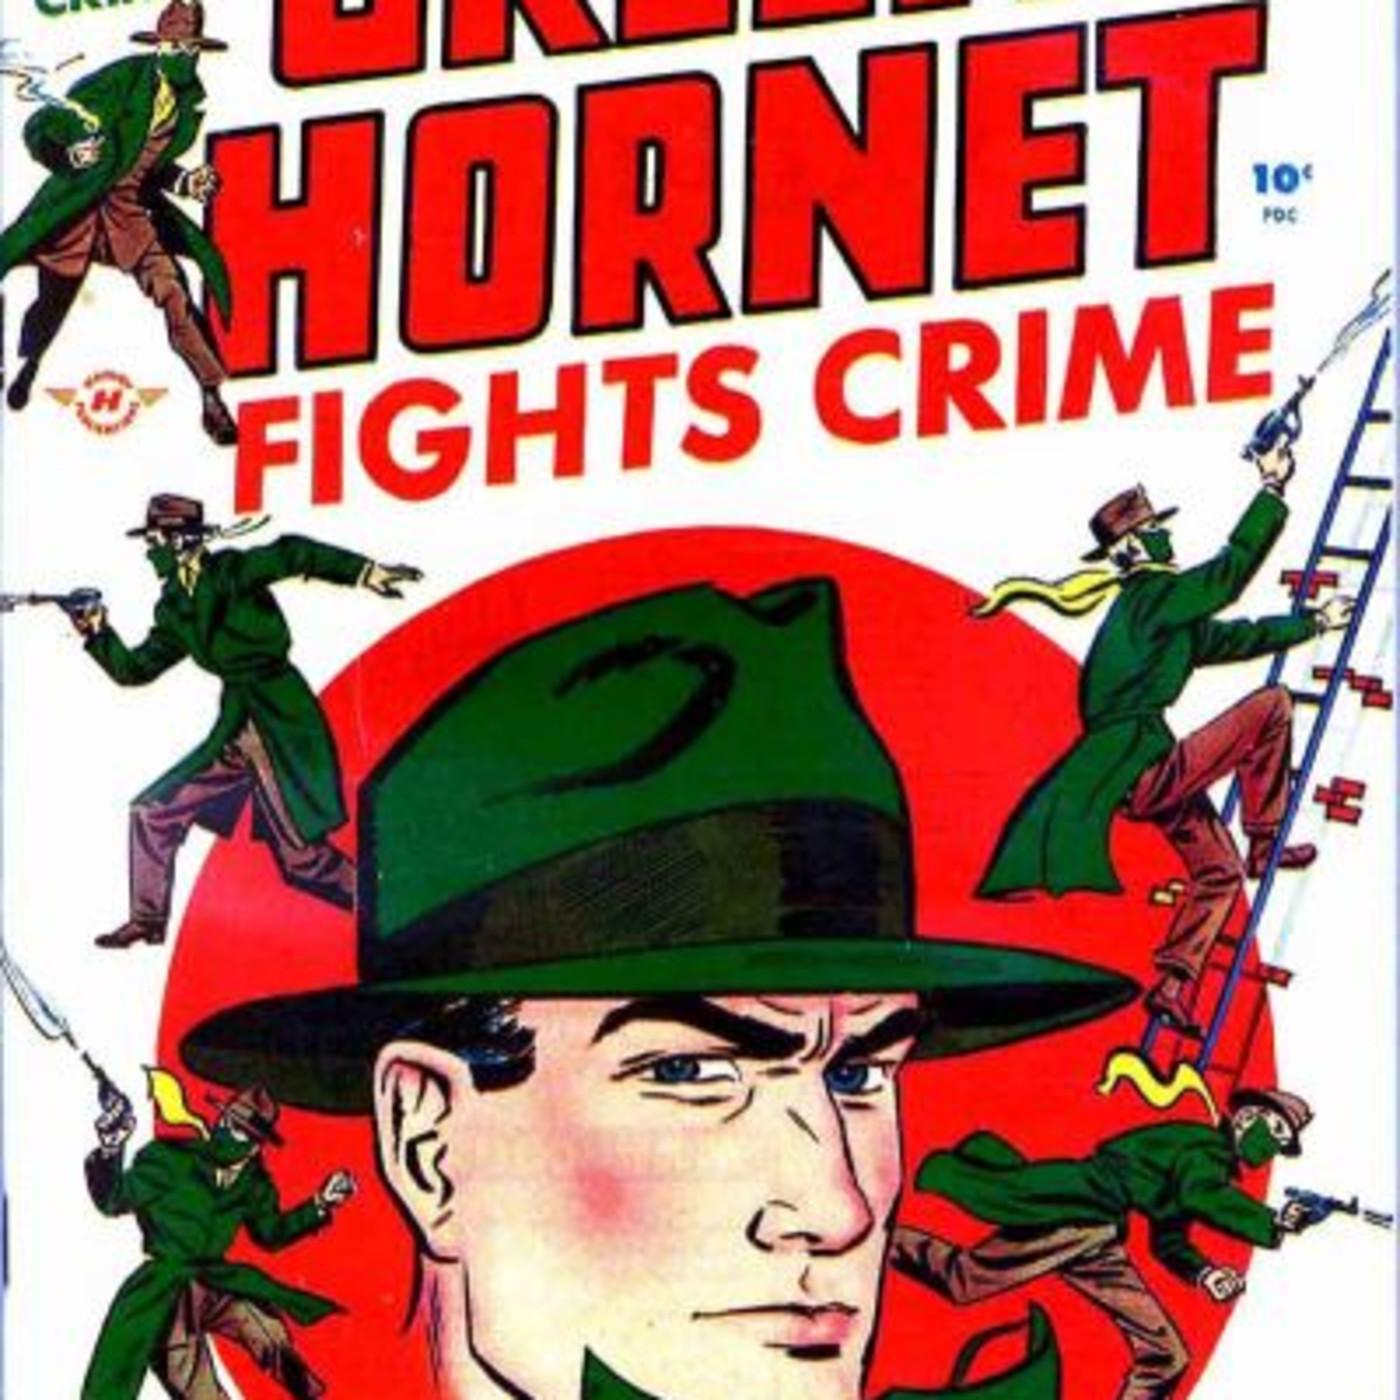 The Green Hornet - 00 - 451213PaidInFull